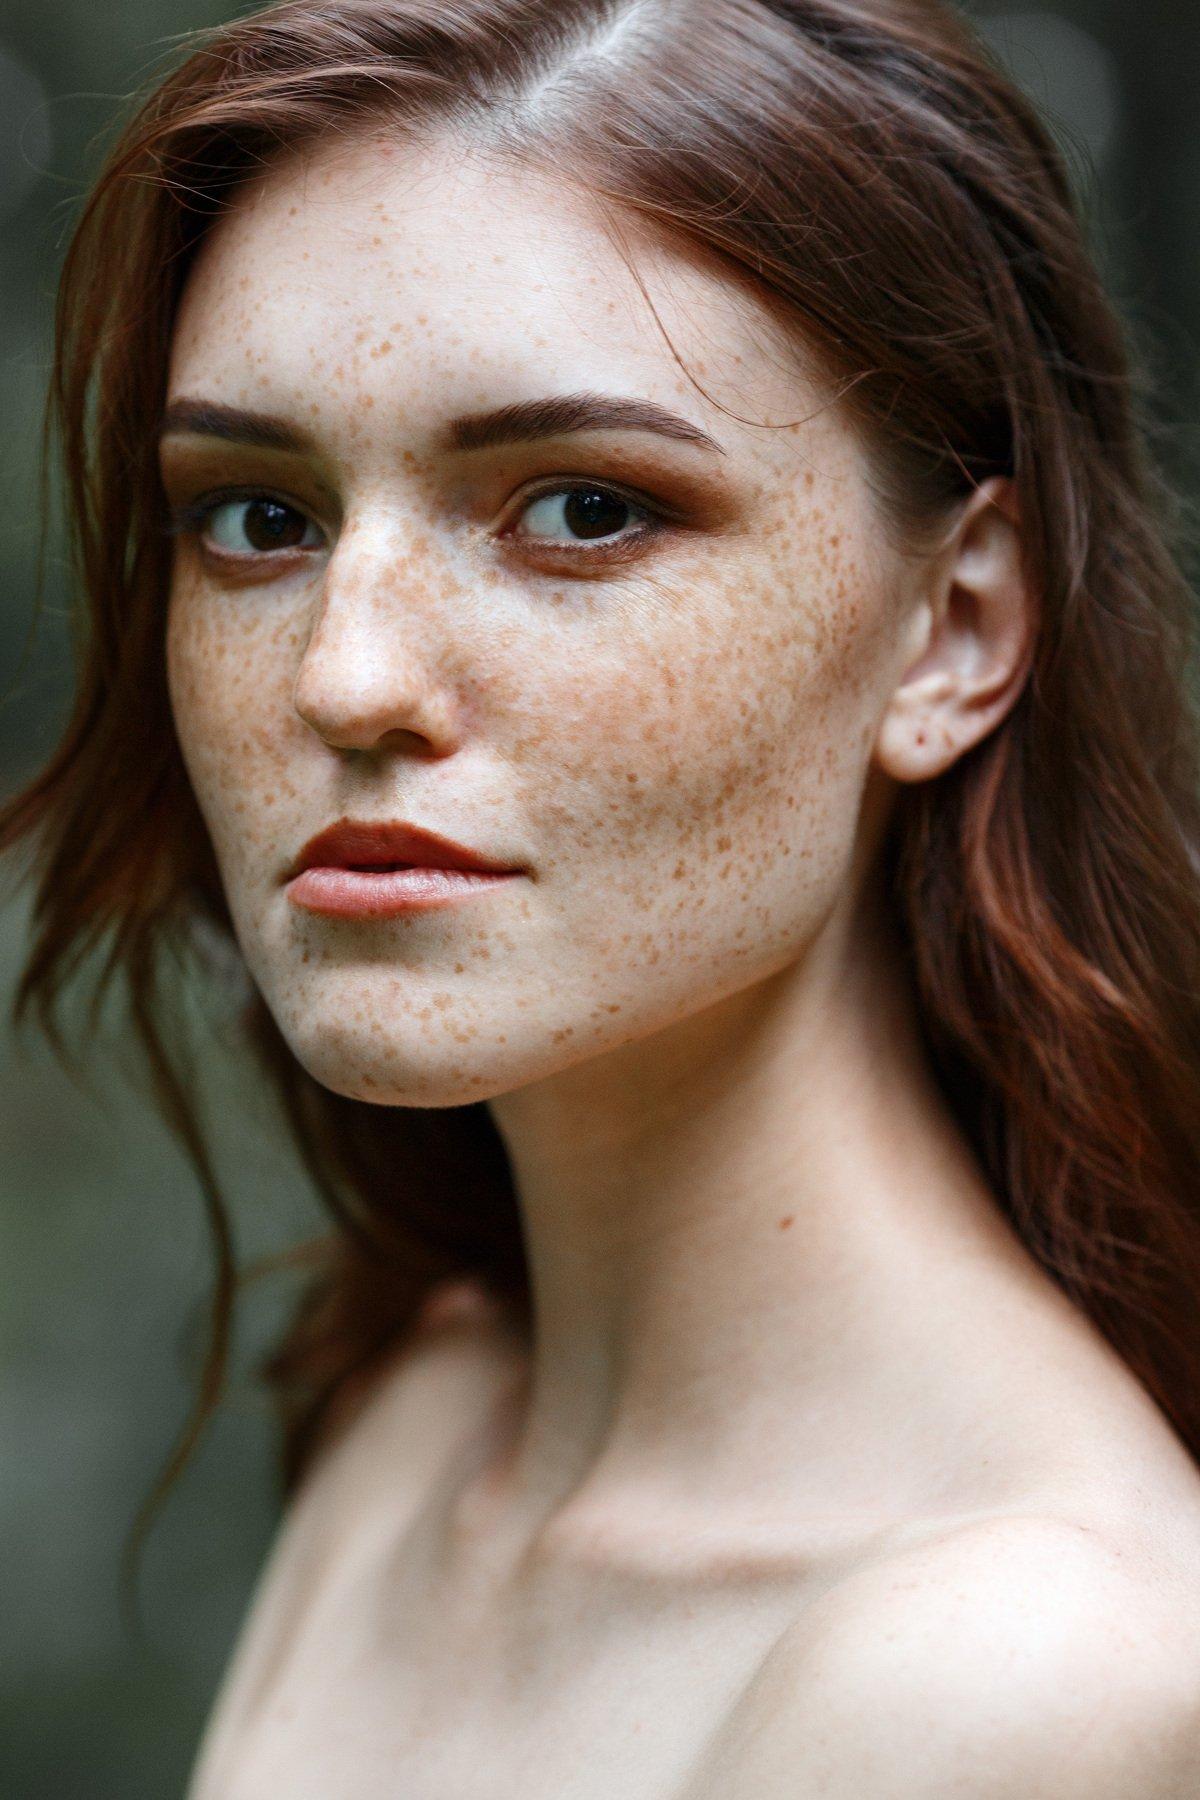 Girl, Photography, Portrait, Цвелёв Дмитрий